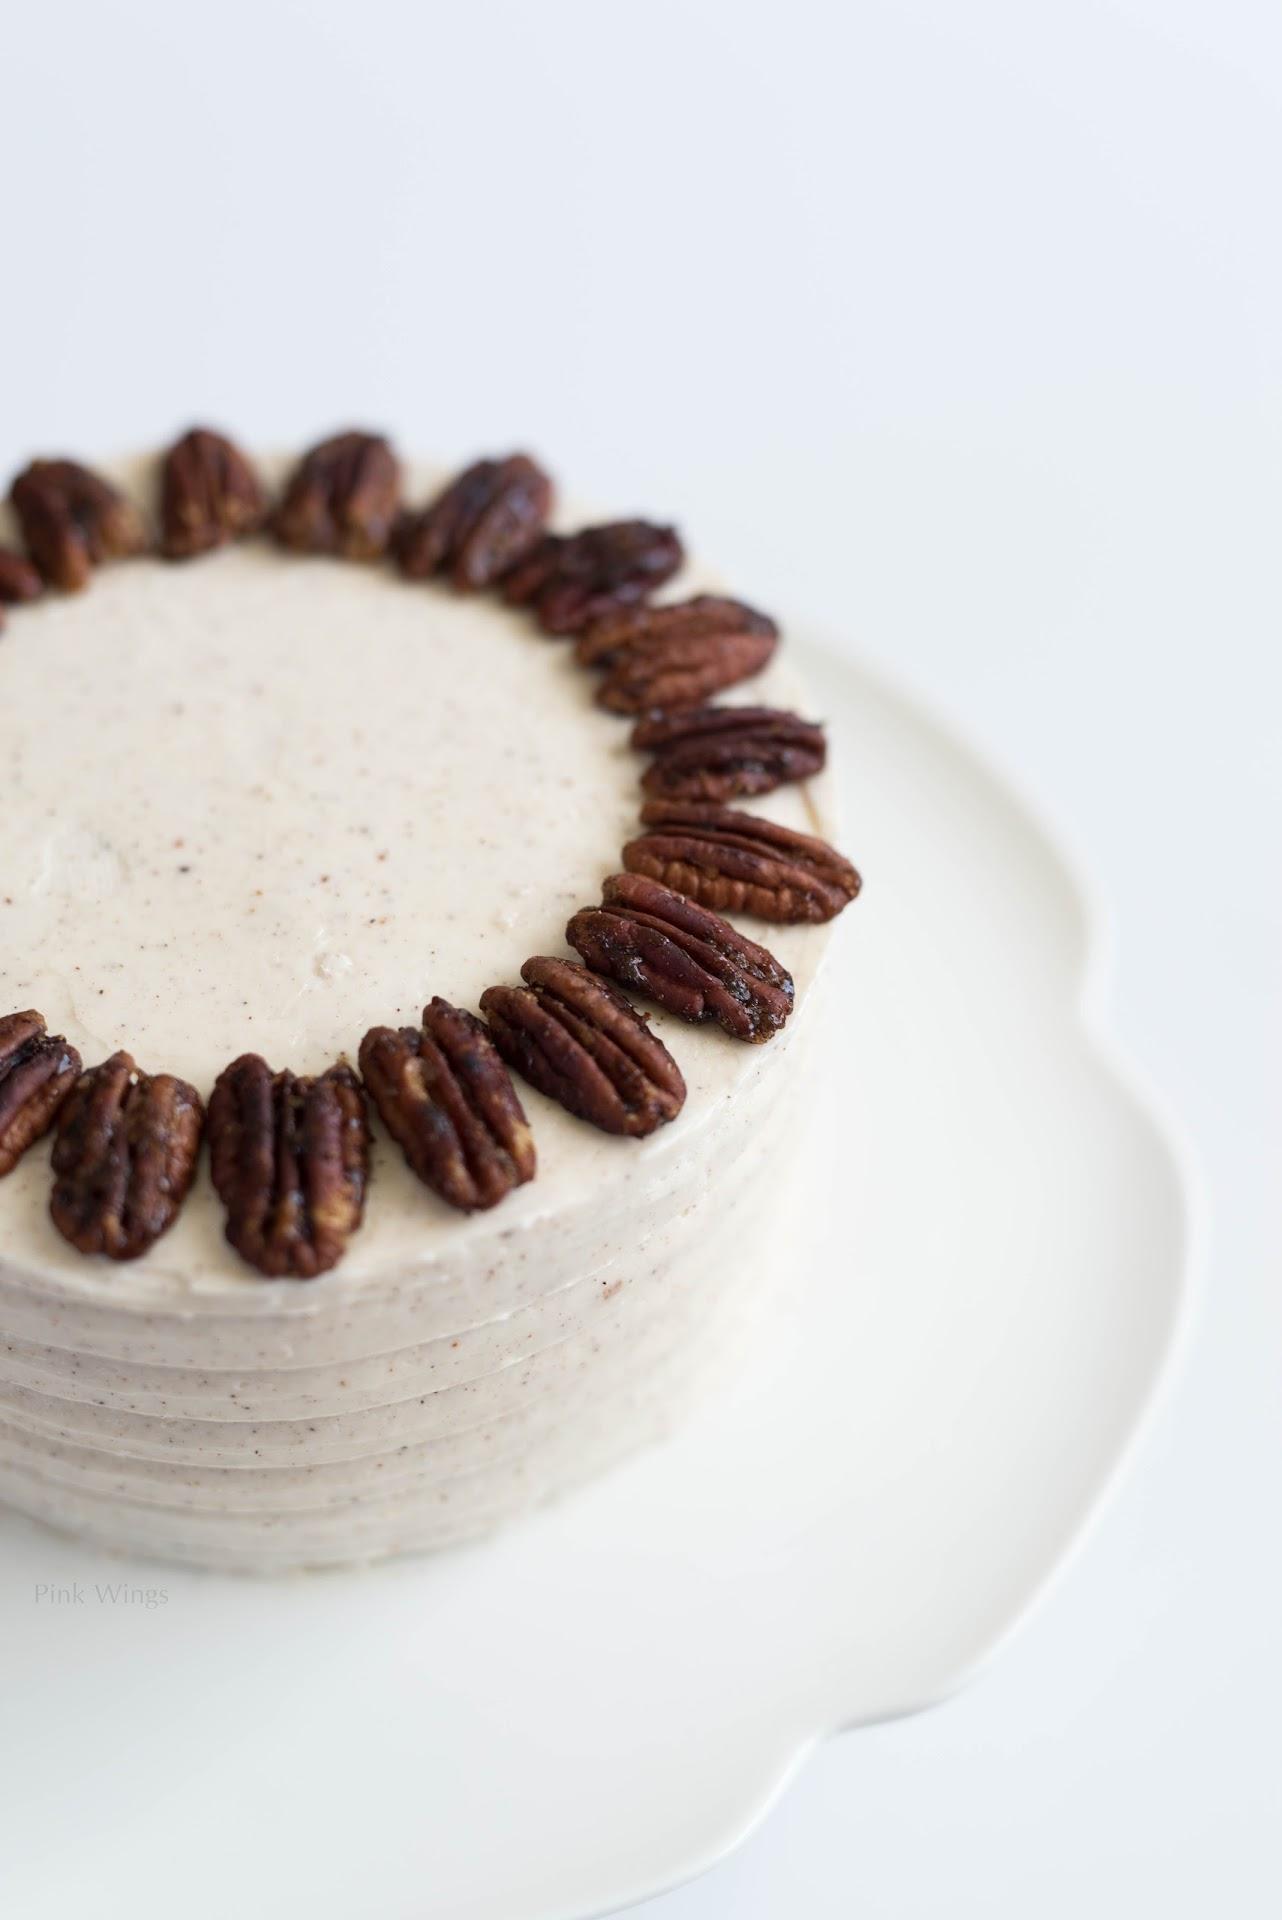 six inch cake, small mini cake, pear dessert, fall autumn, cinnamon nutmeg icing